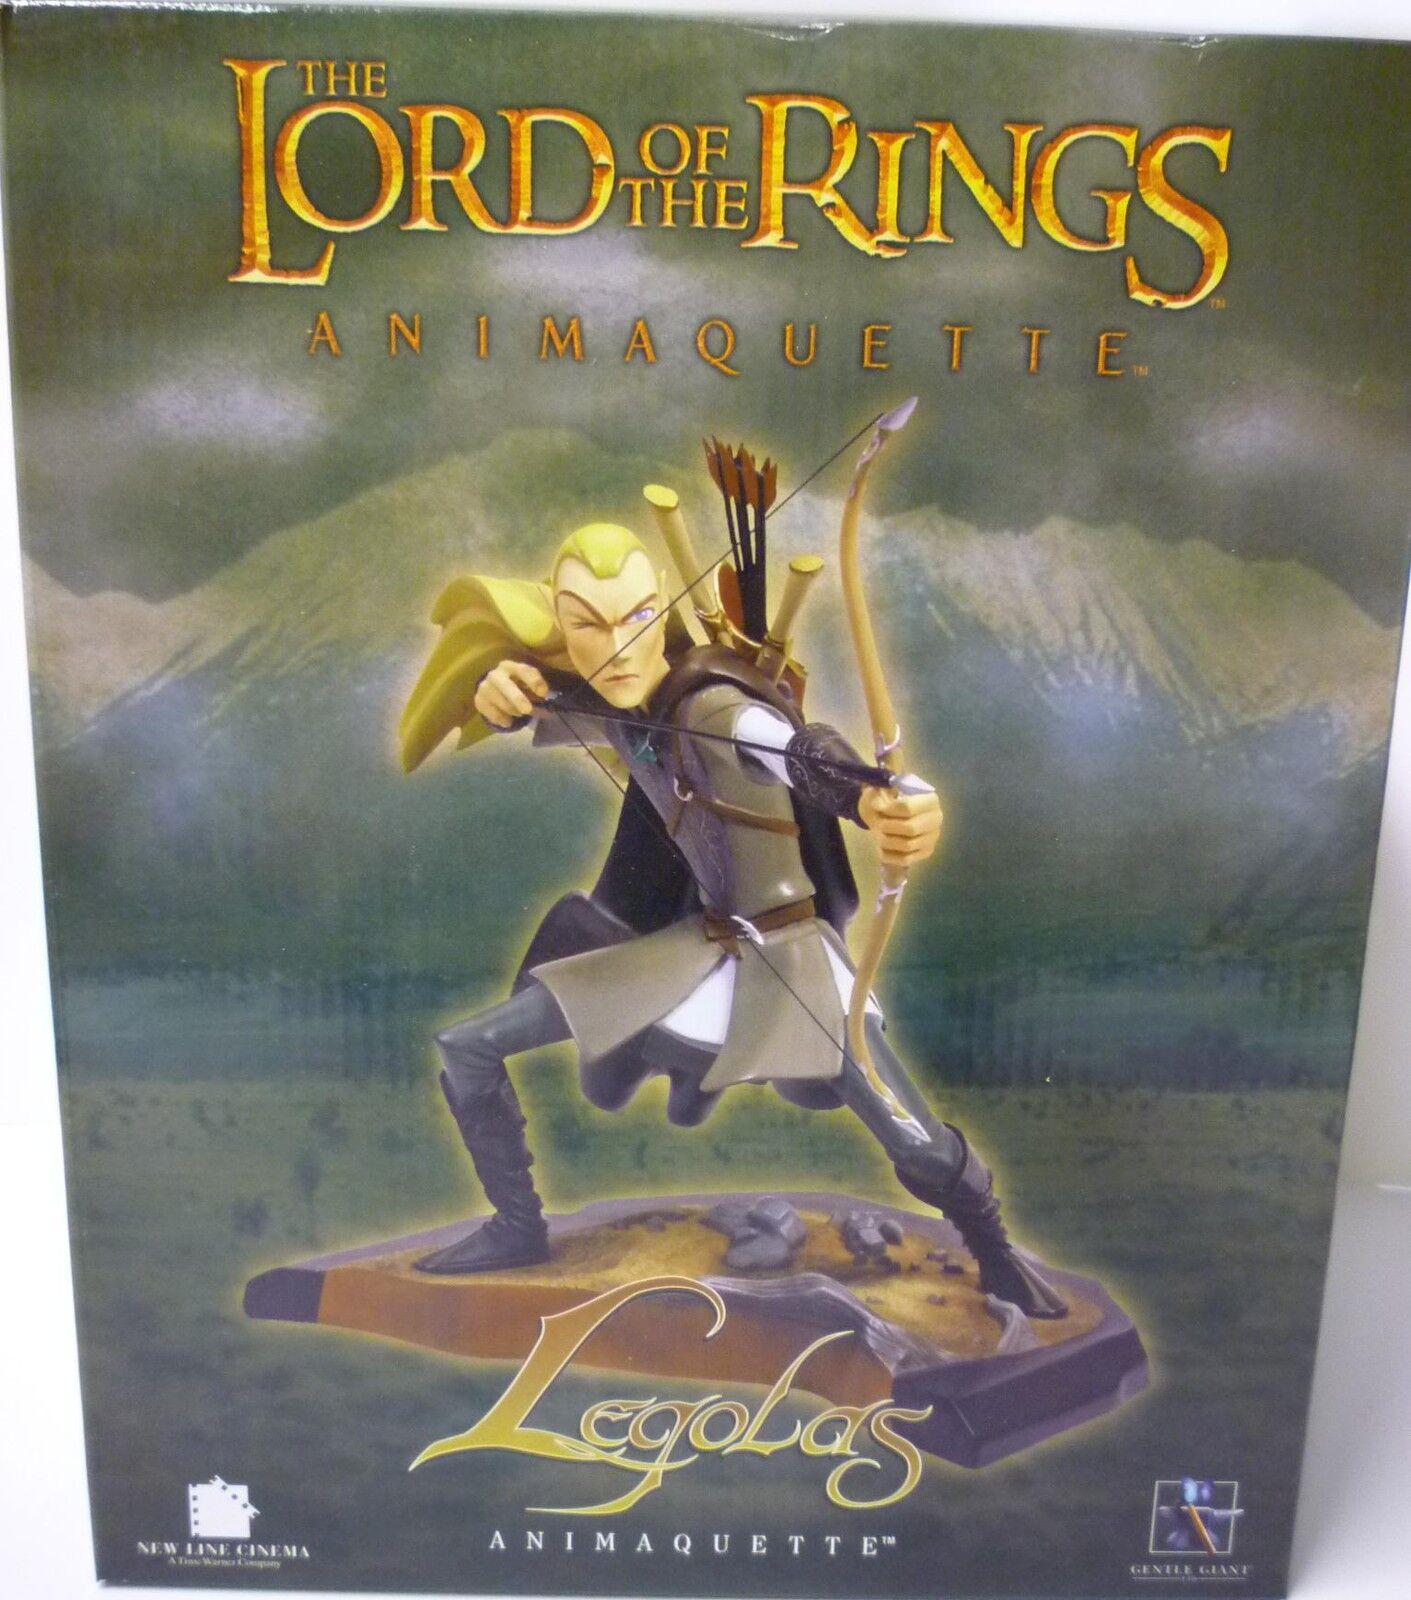 Lord of the Rings Legolas & Gimli 2 Animaquette Statues set Orlando Bloom .